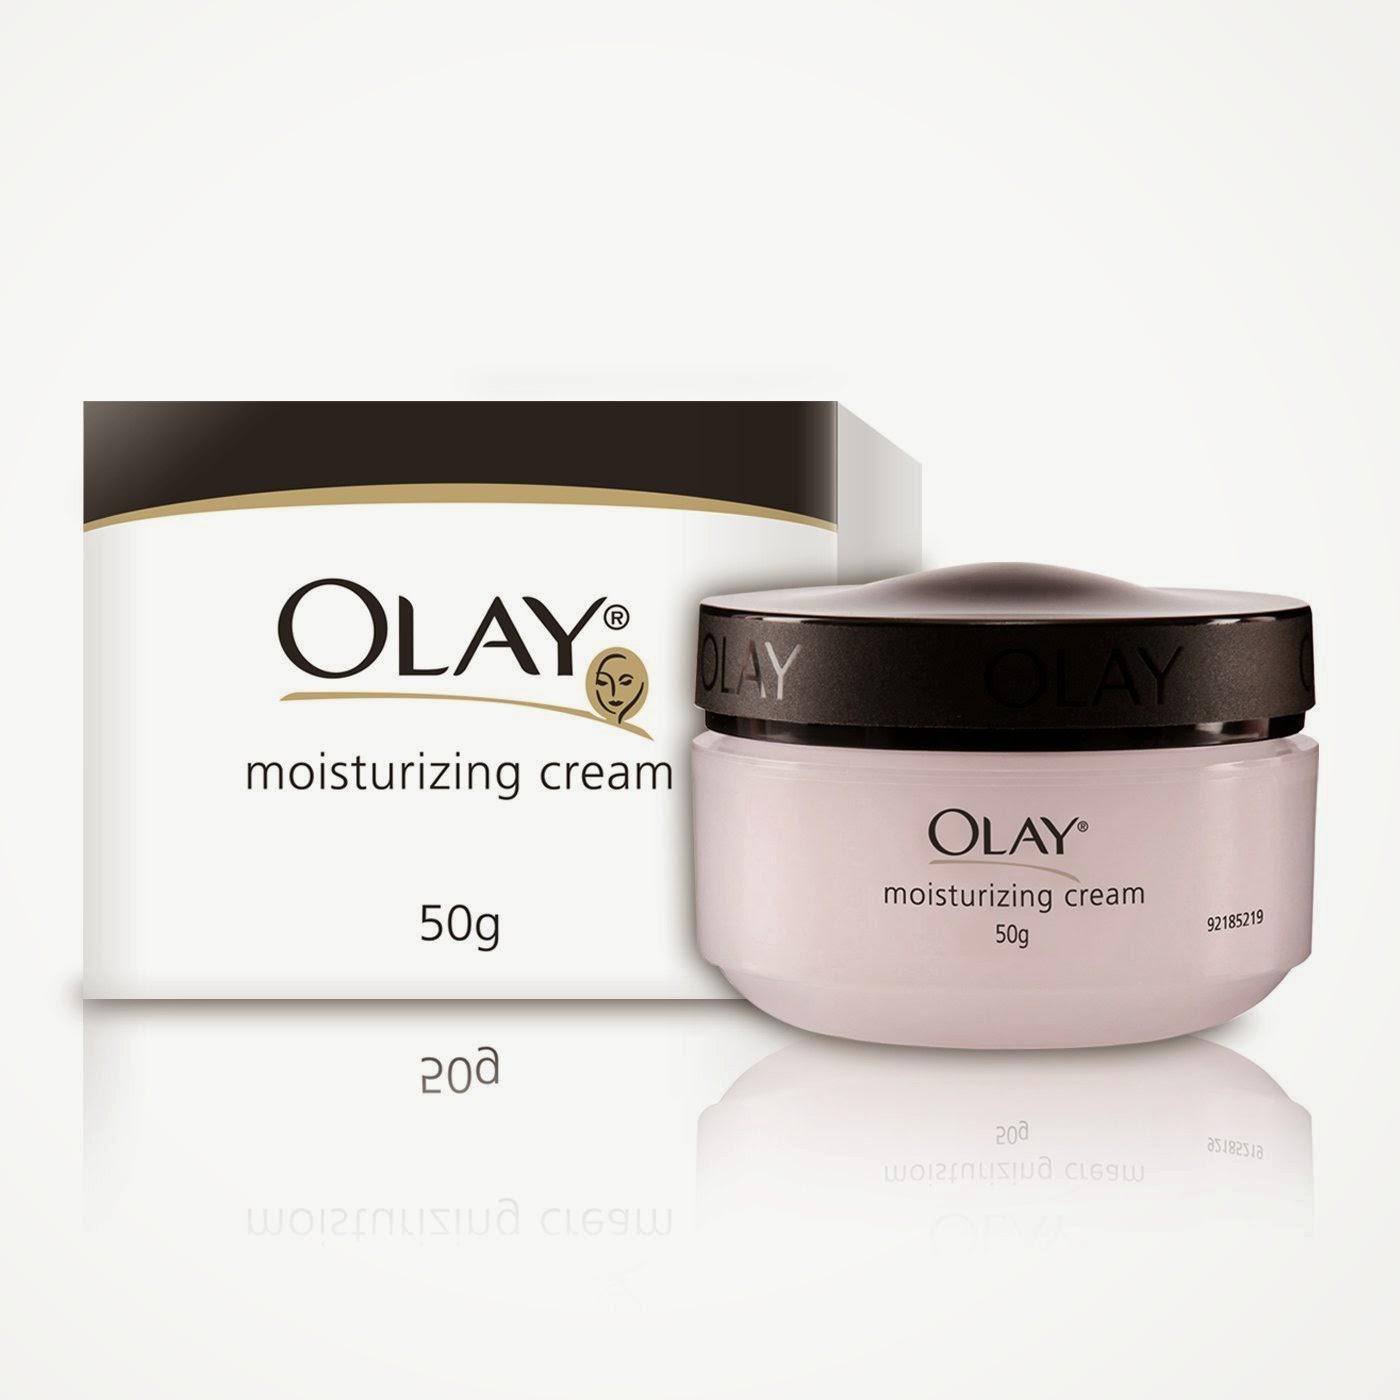 Buy Olay Moisturizing Skin Cream, 50g Rs. 165 only at Amazon.